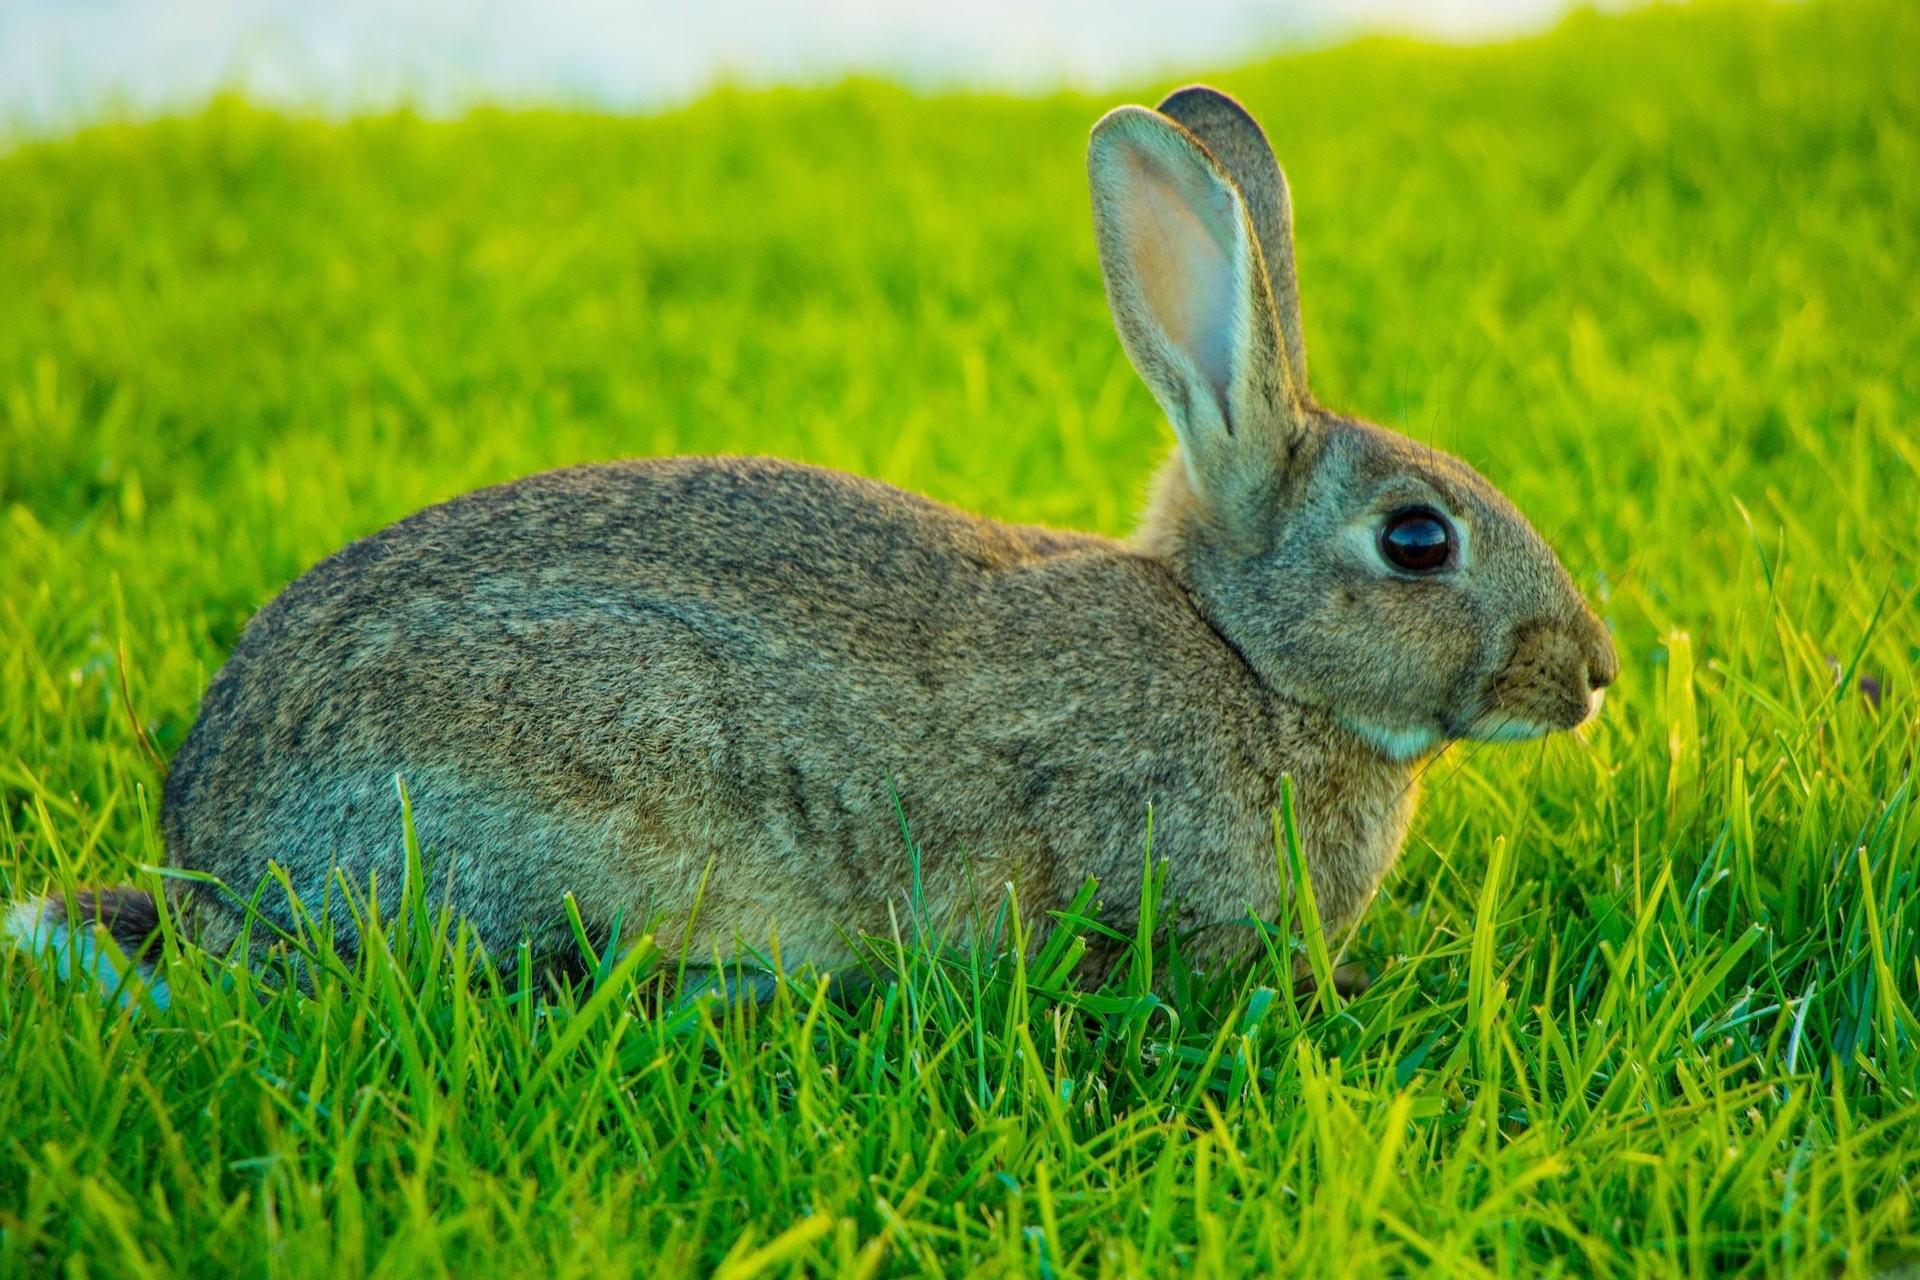 rabbit-2650708_1920 (1).jpg